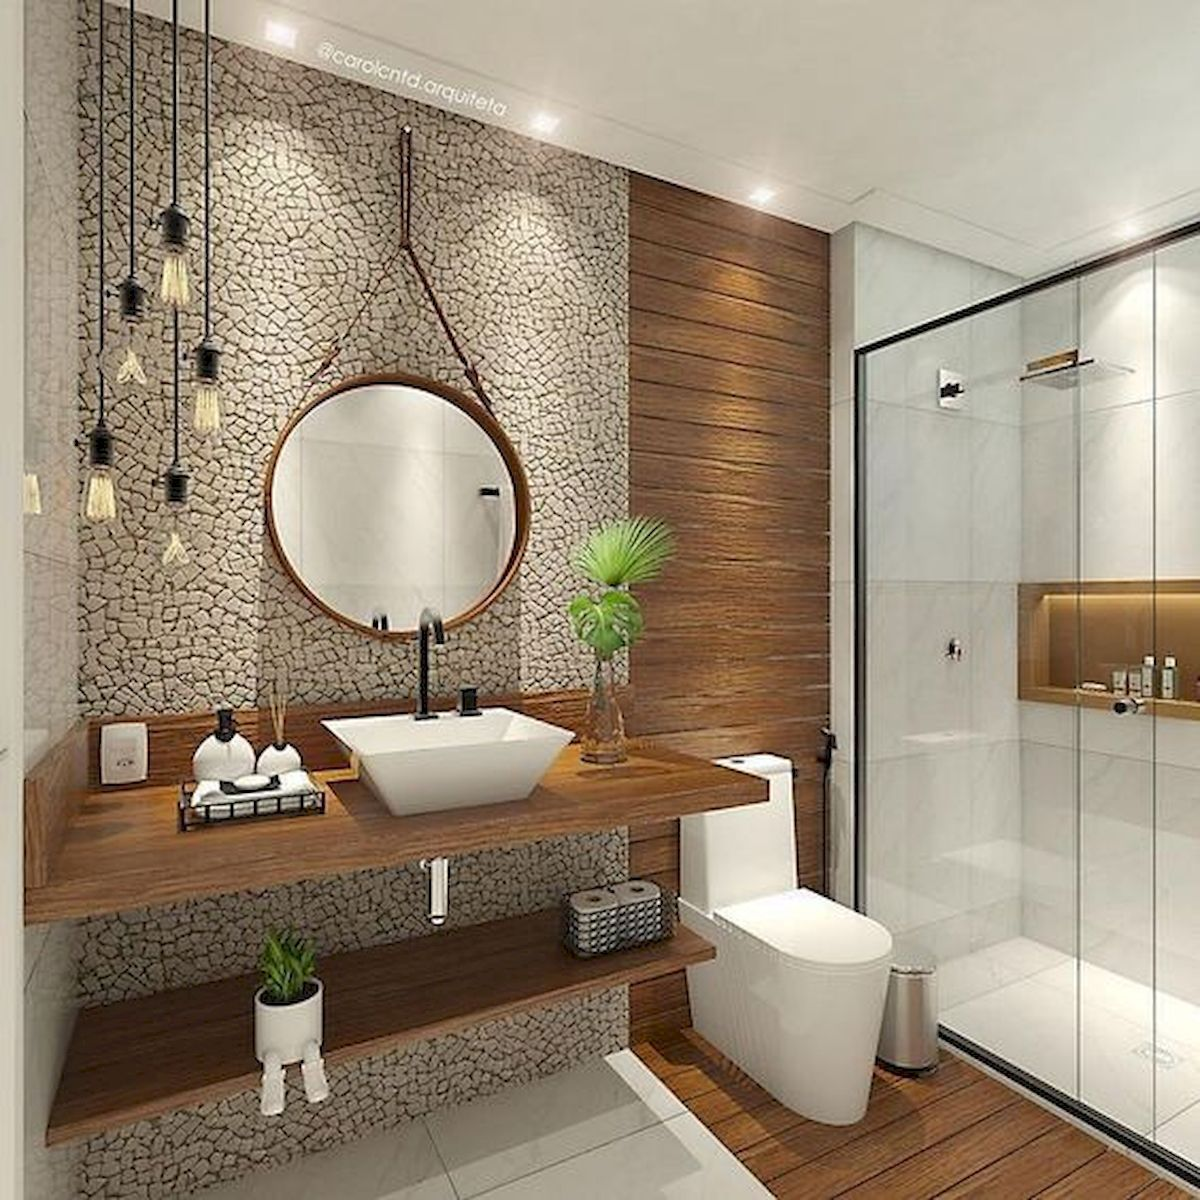 60 Elegant Small Master Bathroom Remodel Ideas (15 ... on Small Bathroom Remodel Ideas 2019  id=65858